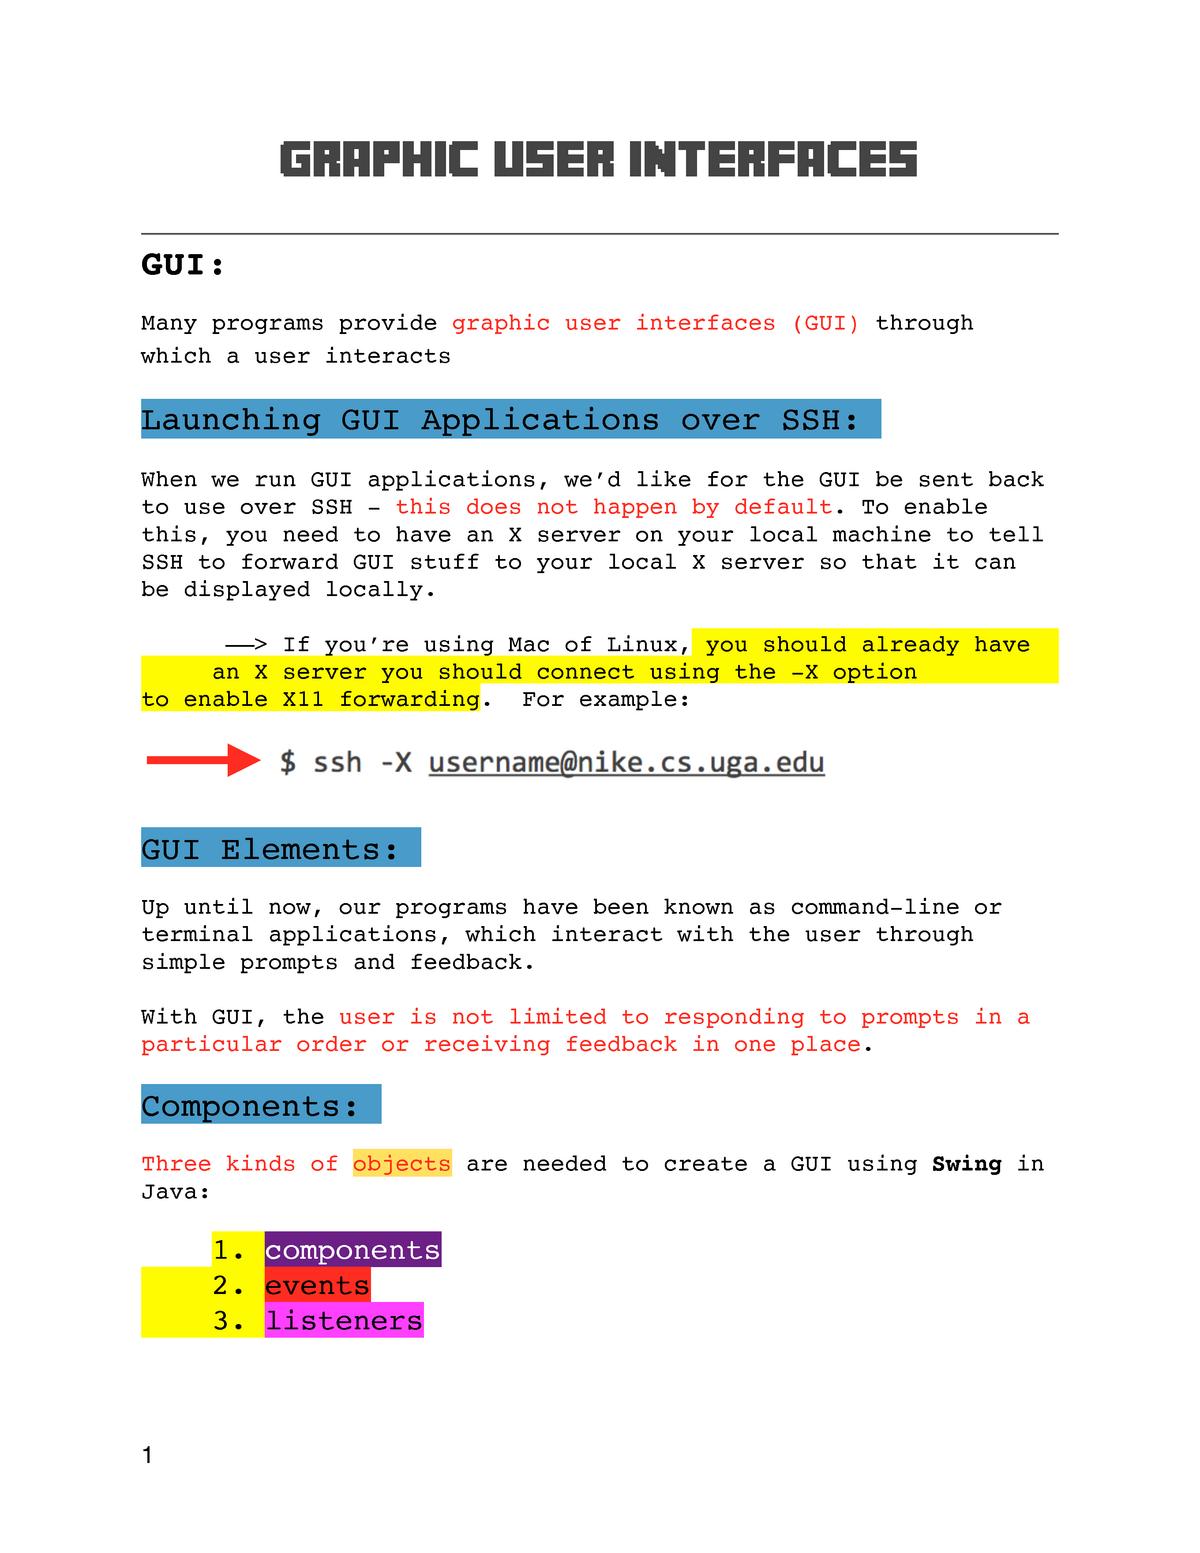 CSCI 1302 - Software Development (Java Swing) - CSCI 1302